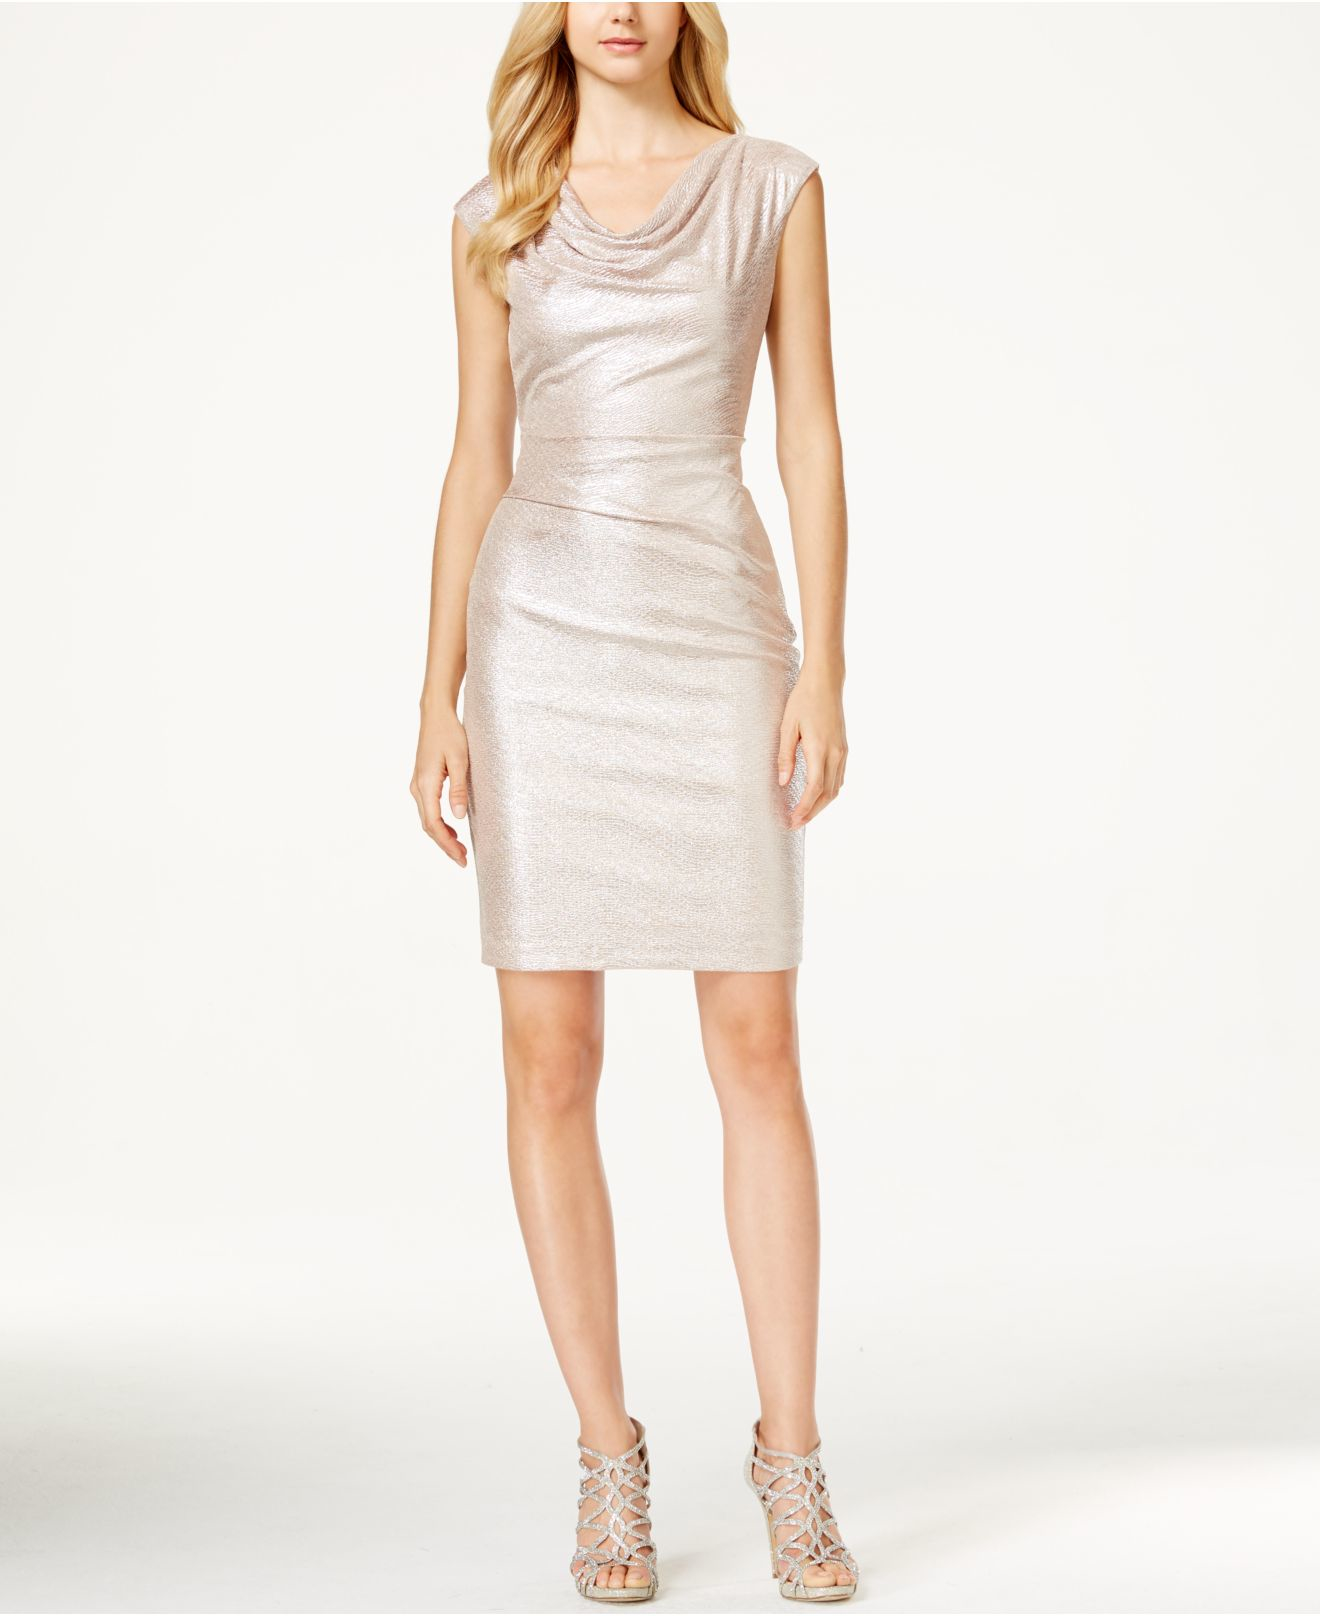 Cowl Neck Sheath Dresses: Vince Camuto Metallic Cowl-neck Sheath Dress In Pink